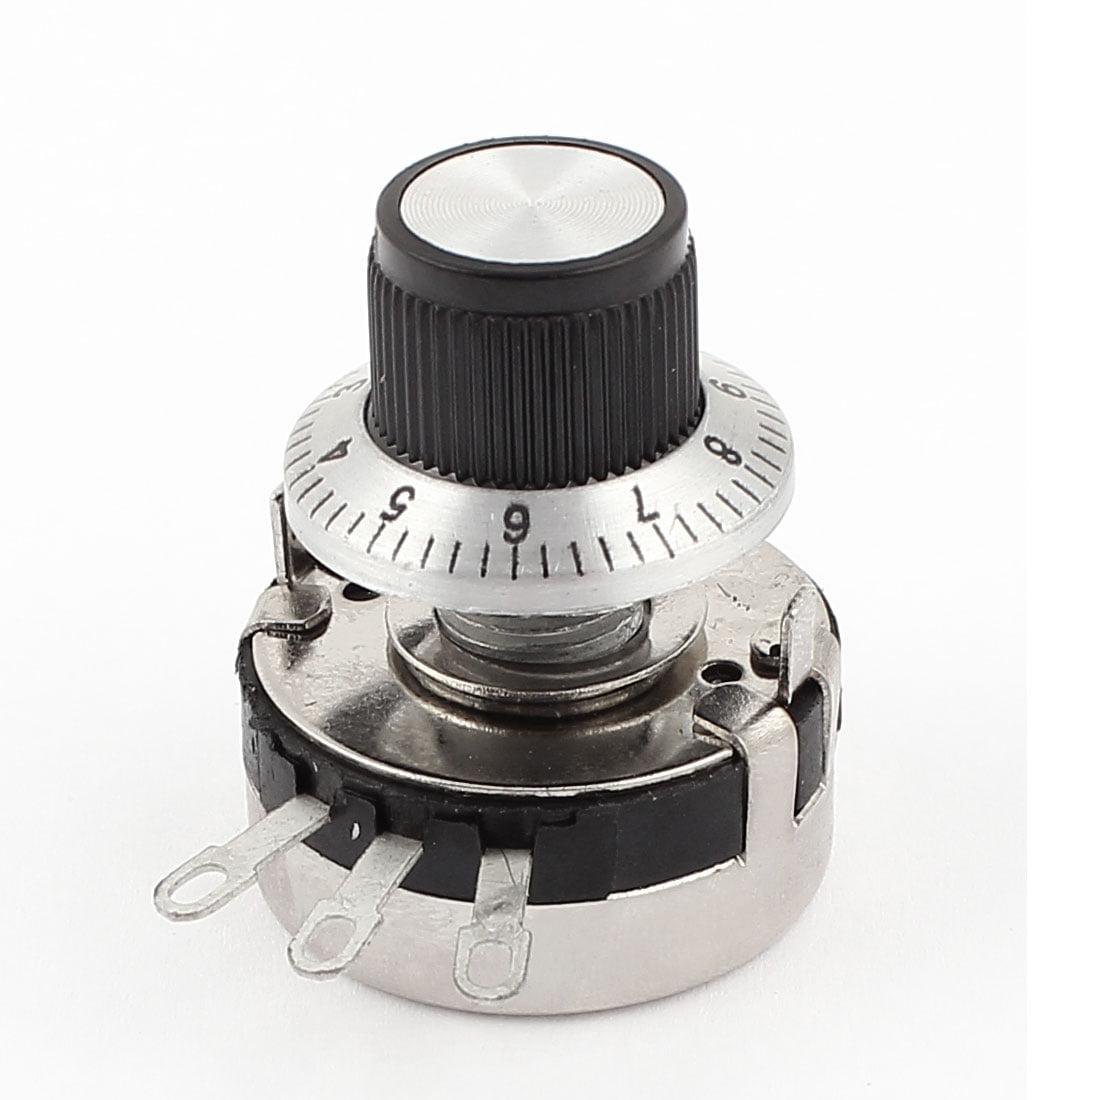 Unique Bargains WTH118-2W 10K ohm Round Shaft Carbon Linear Variable Potentiometer w Dial Knob